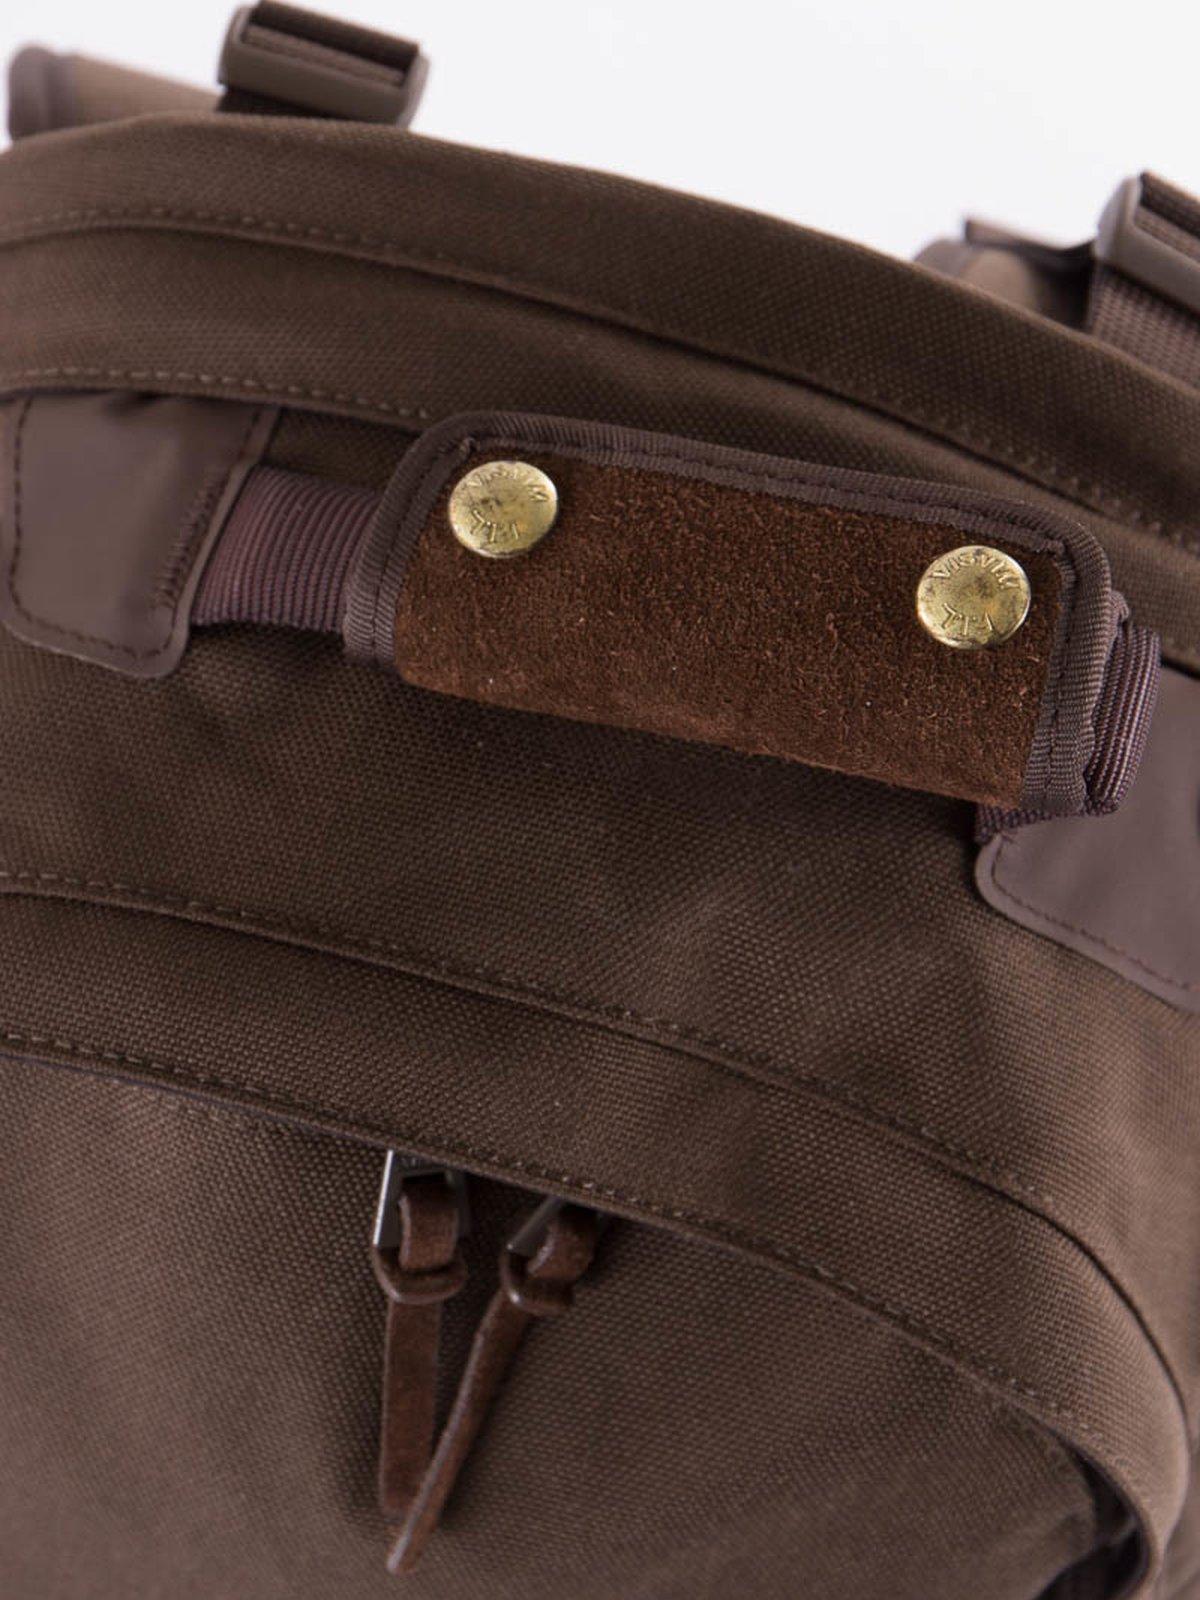 Brown 22L Ballistic Backpack - Image 5